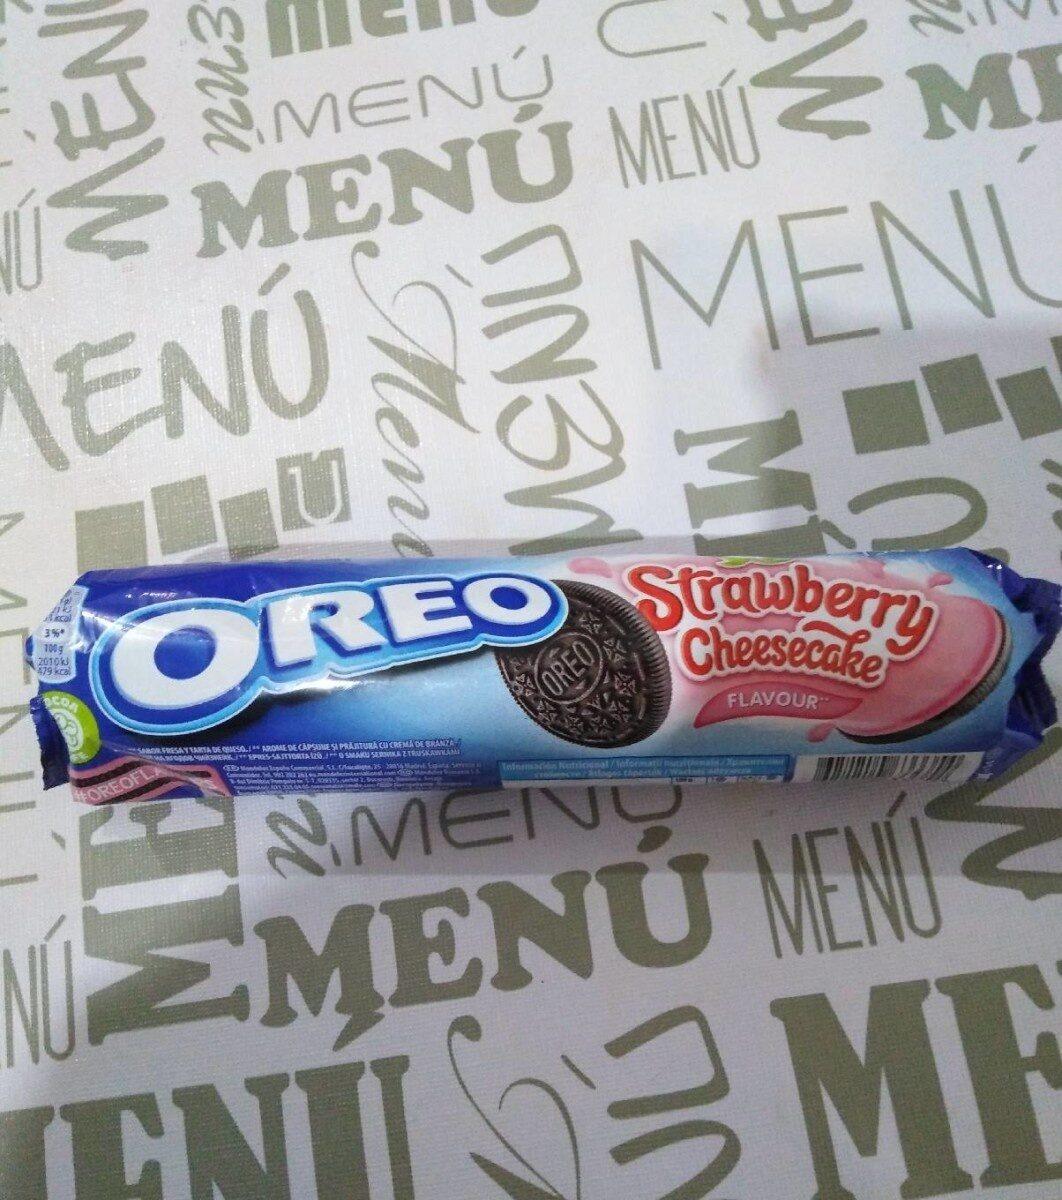 Oreo Strawberry Cheesecake 14er - Продукт - ro